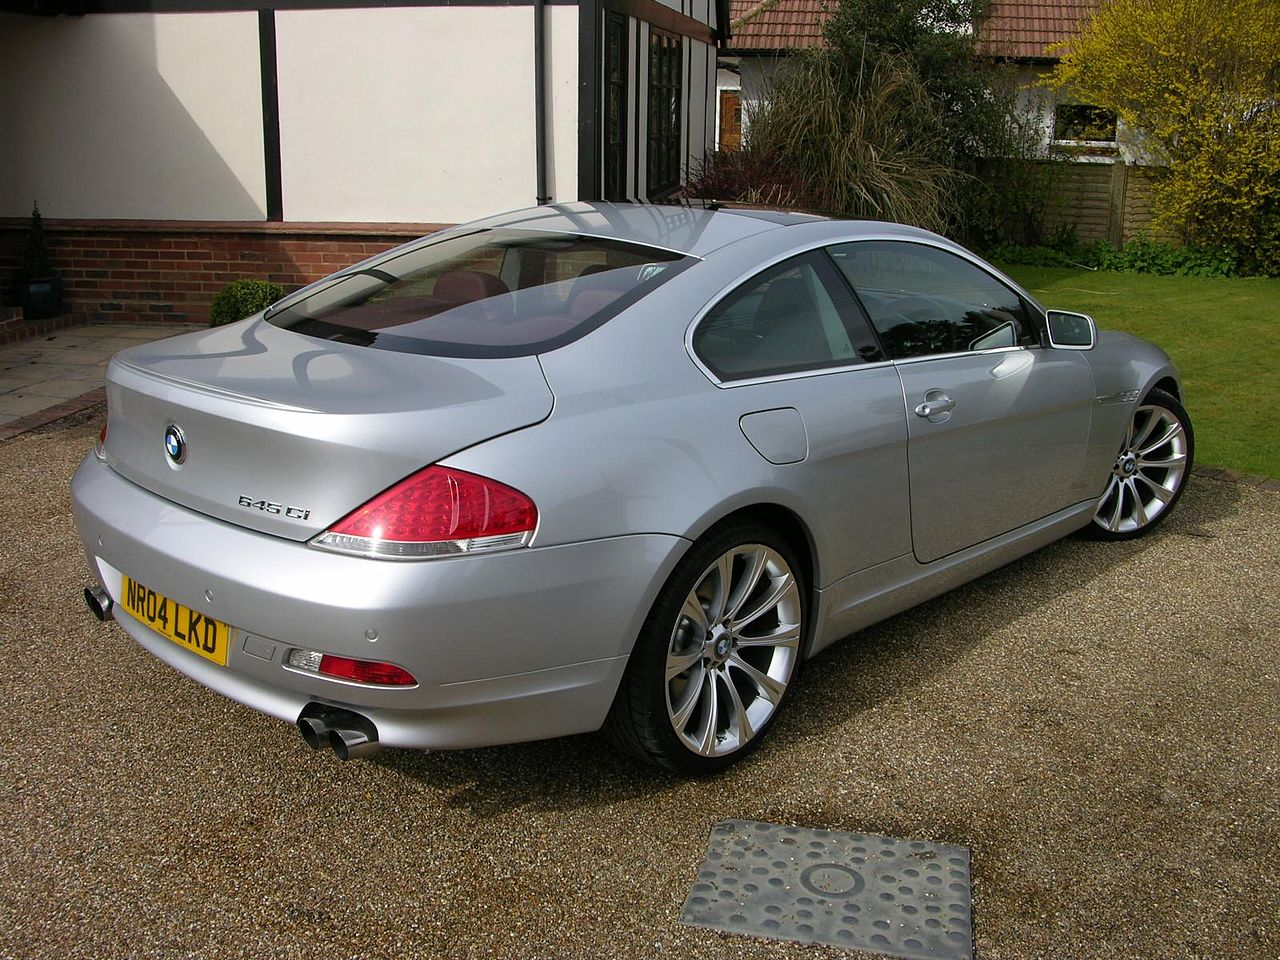 BMW 2004 bmw 645ci : File:2004 BMW 645Ci Sport - Flickr - The Car Spy (1).jpg ...